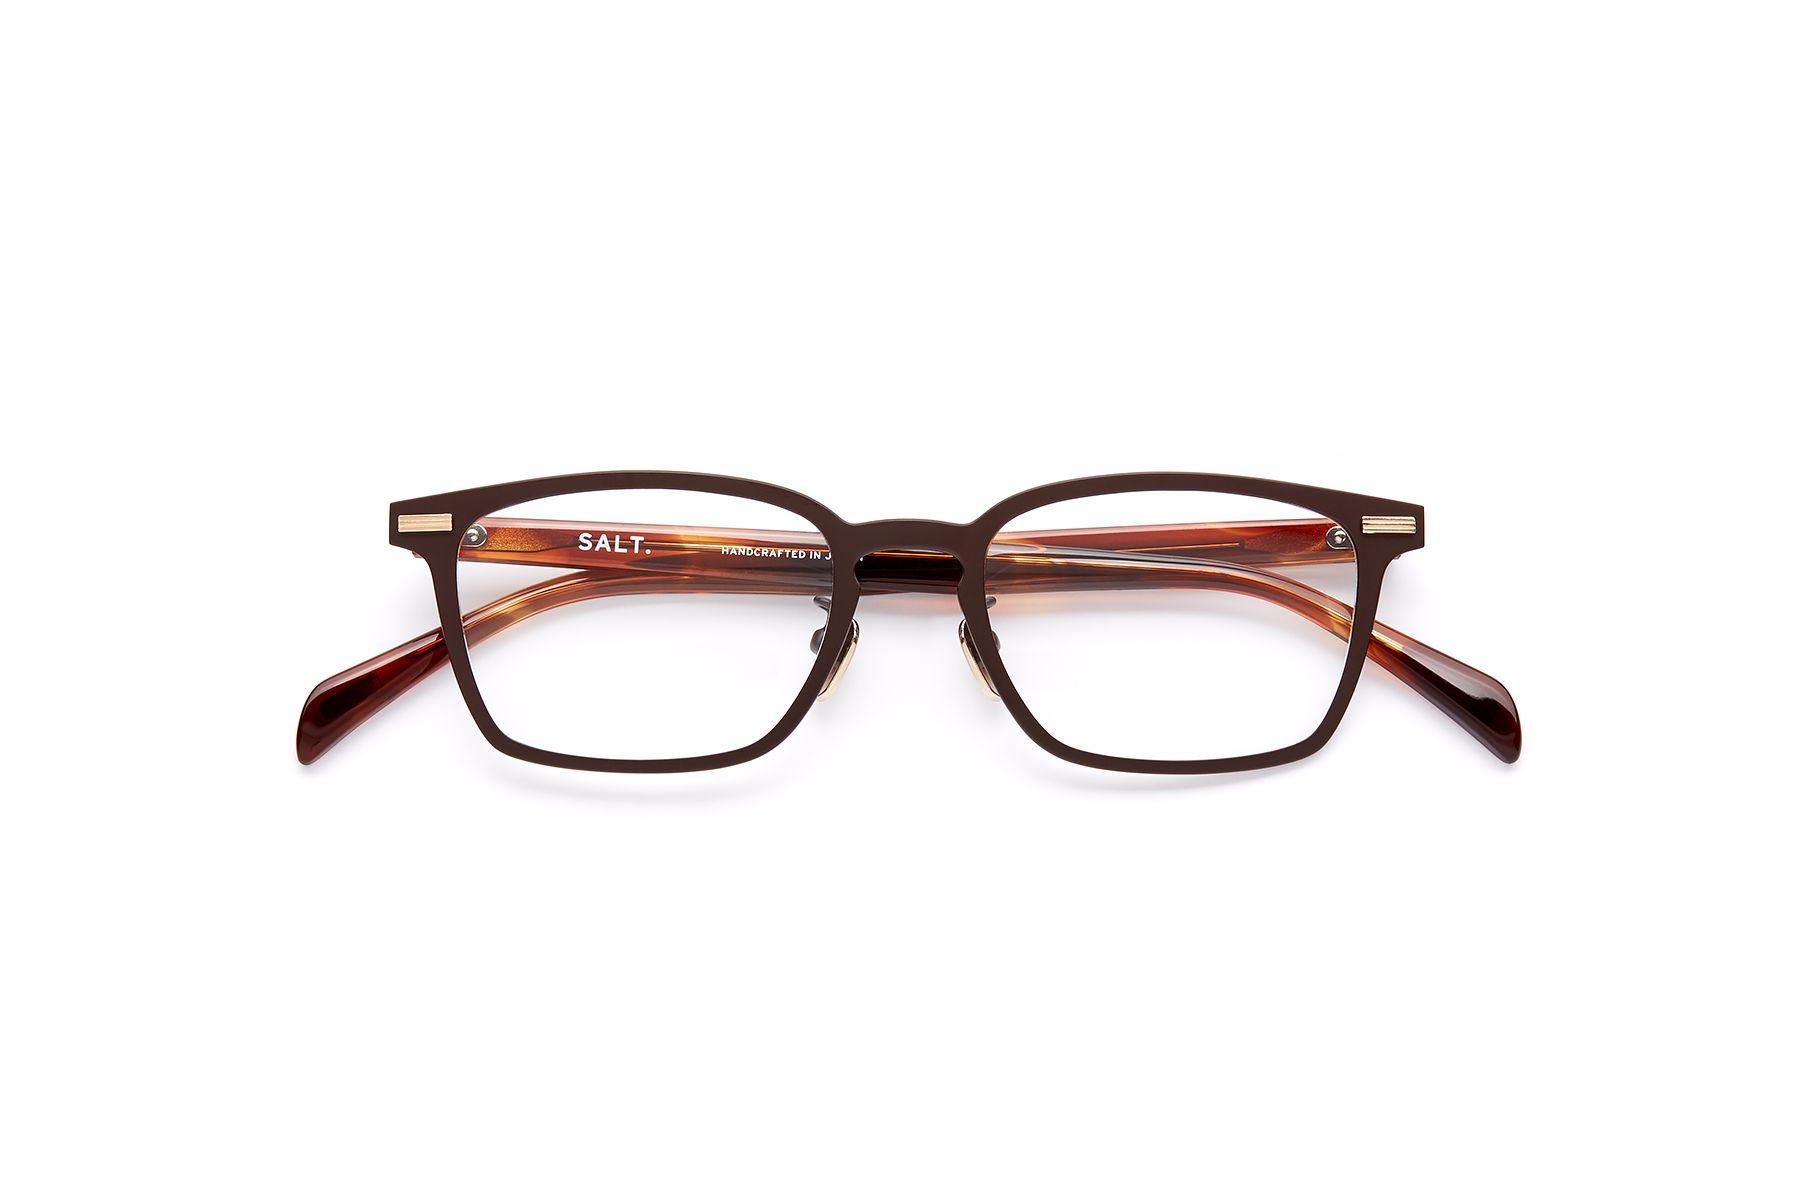 Salt glasses